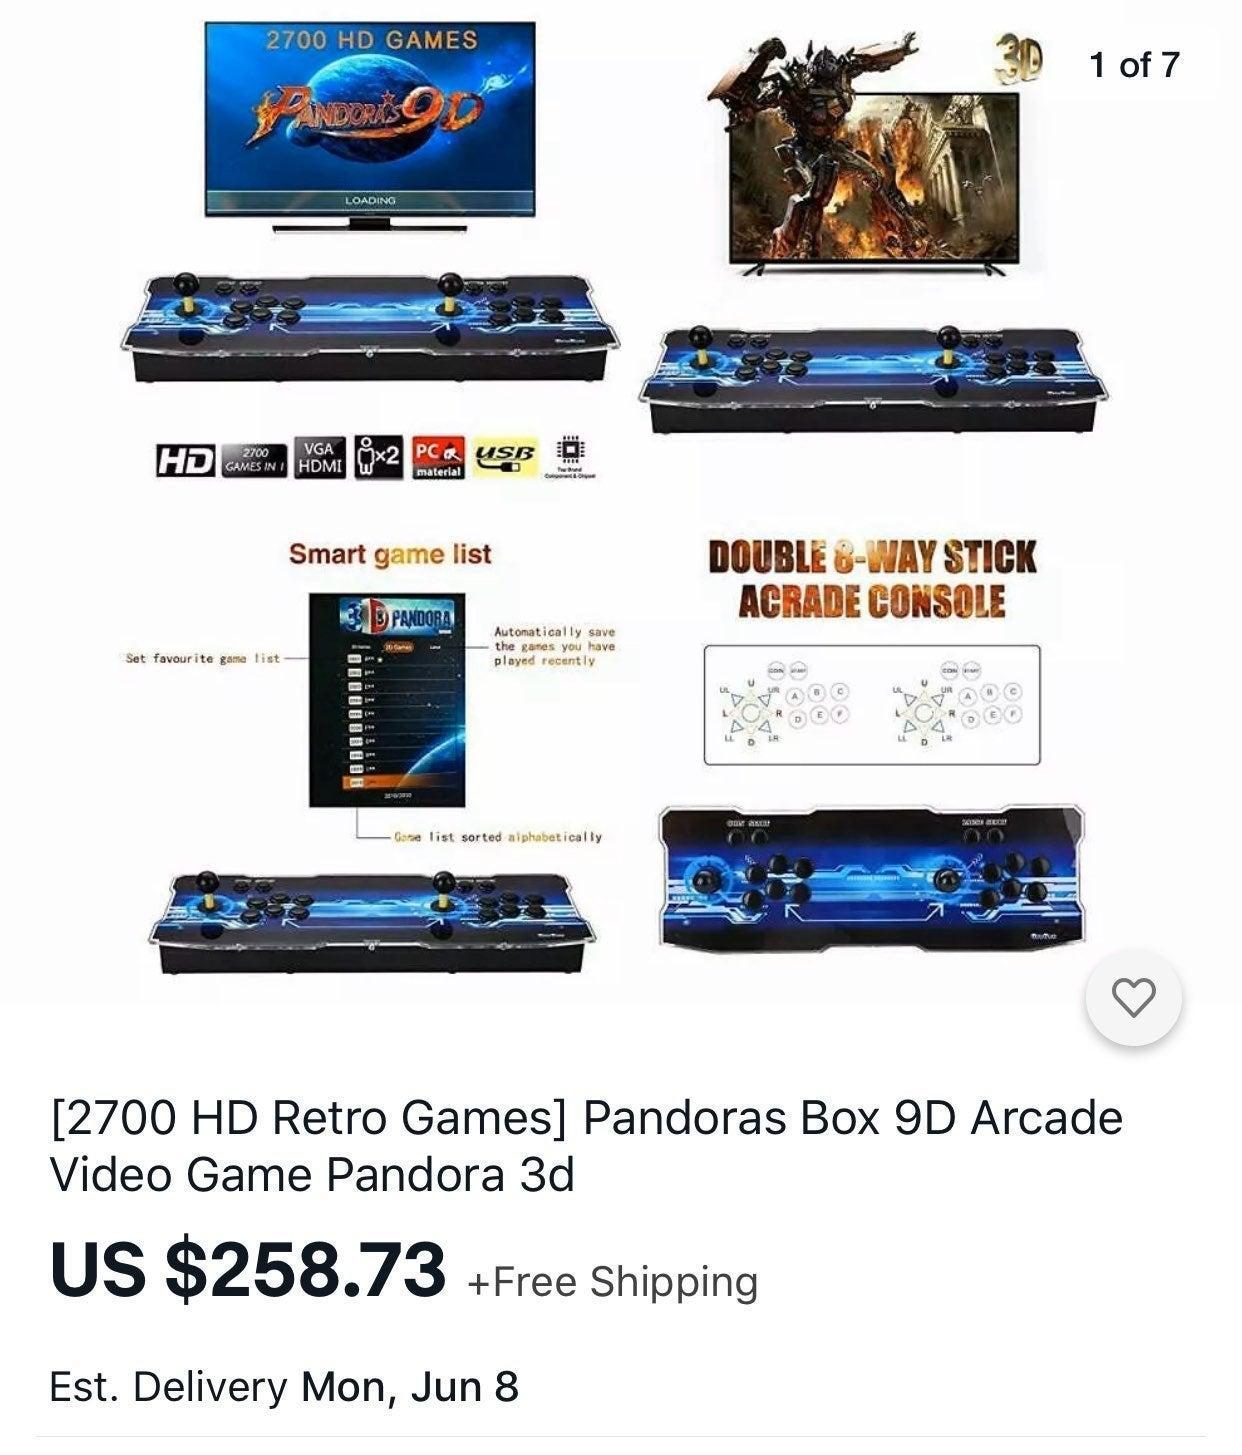 [2700 HD Retro Games] Pandoras Box 9D